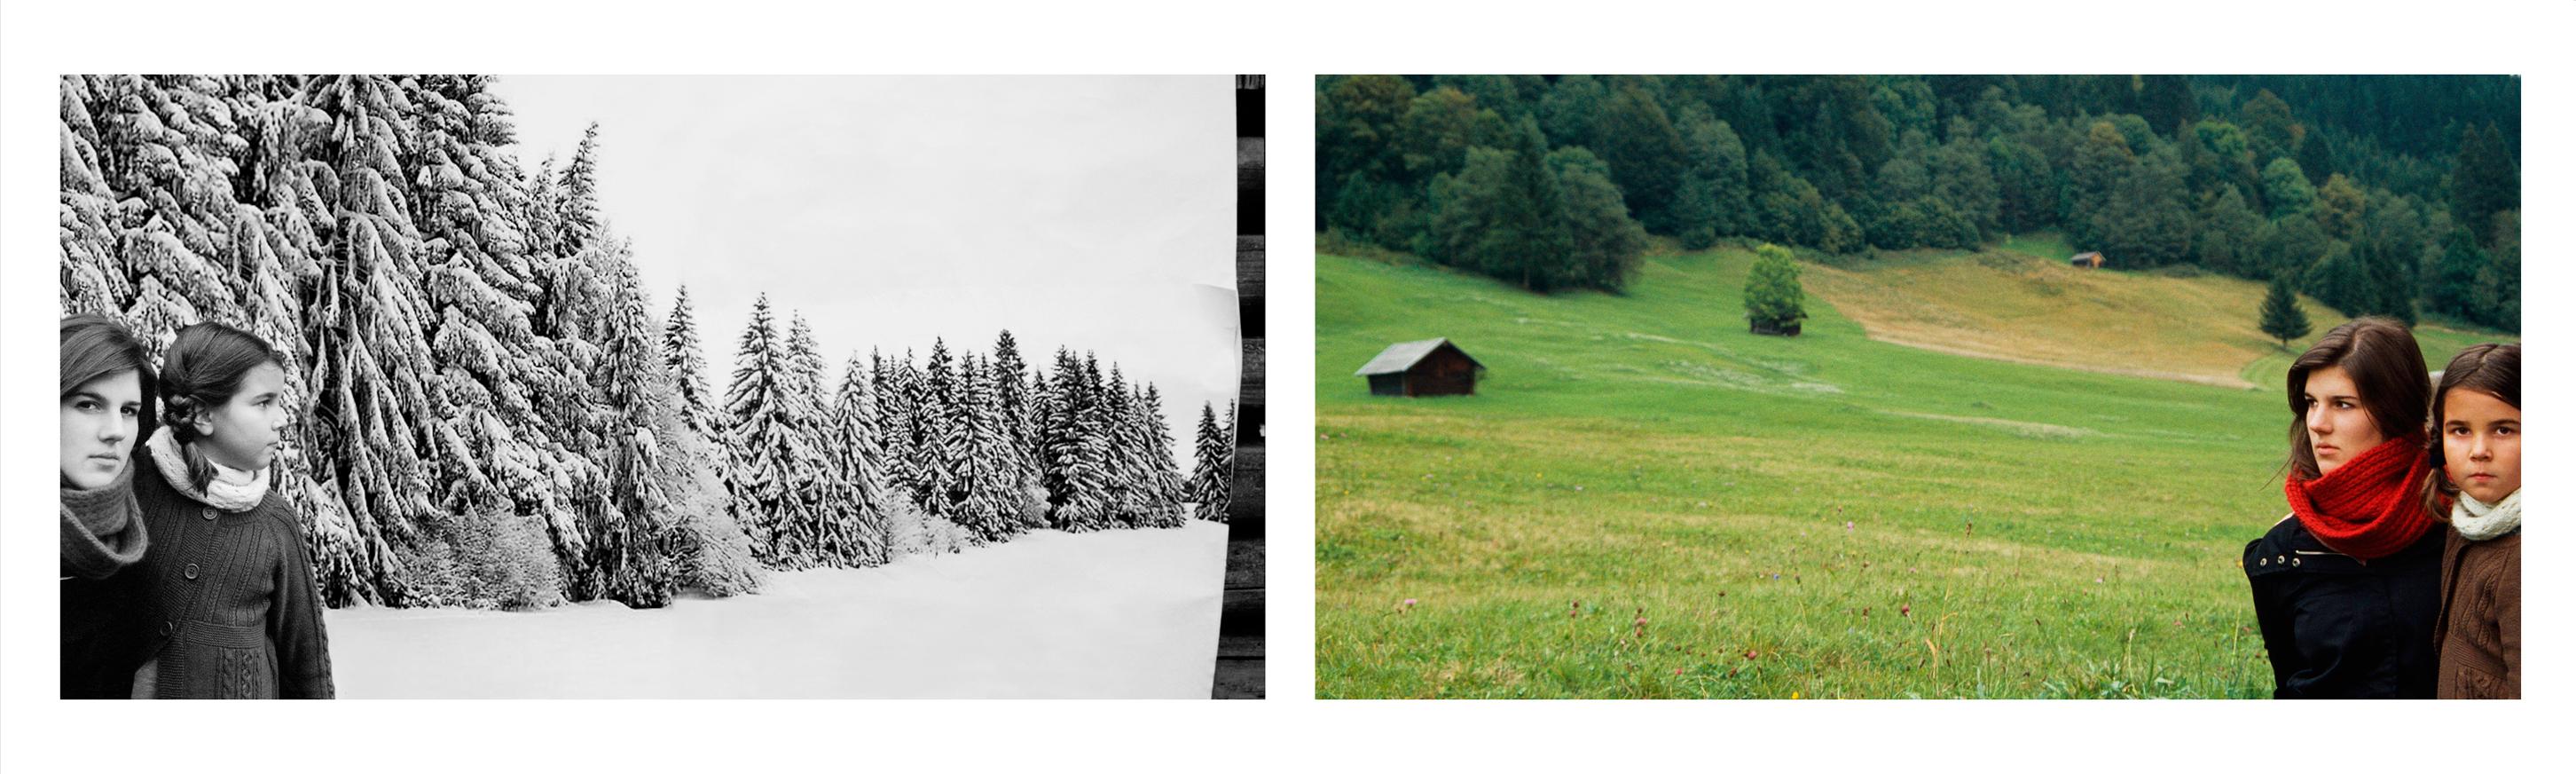 » Exposure #74: Wagenbruchsee, Bavaria, 09.19.09, 5:22 p.m.